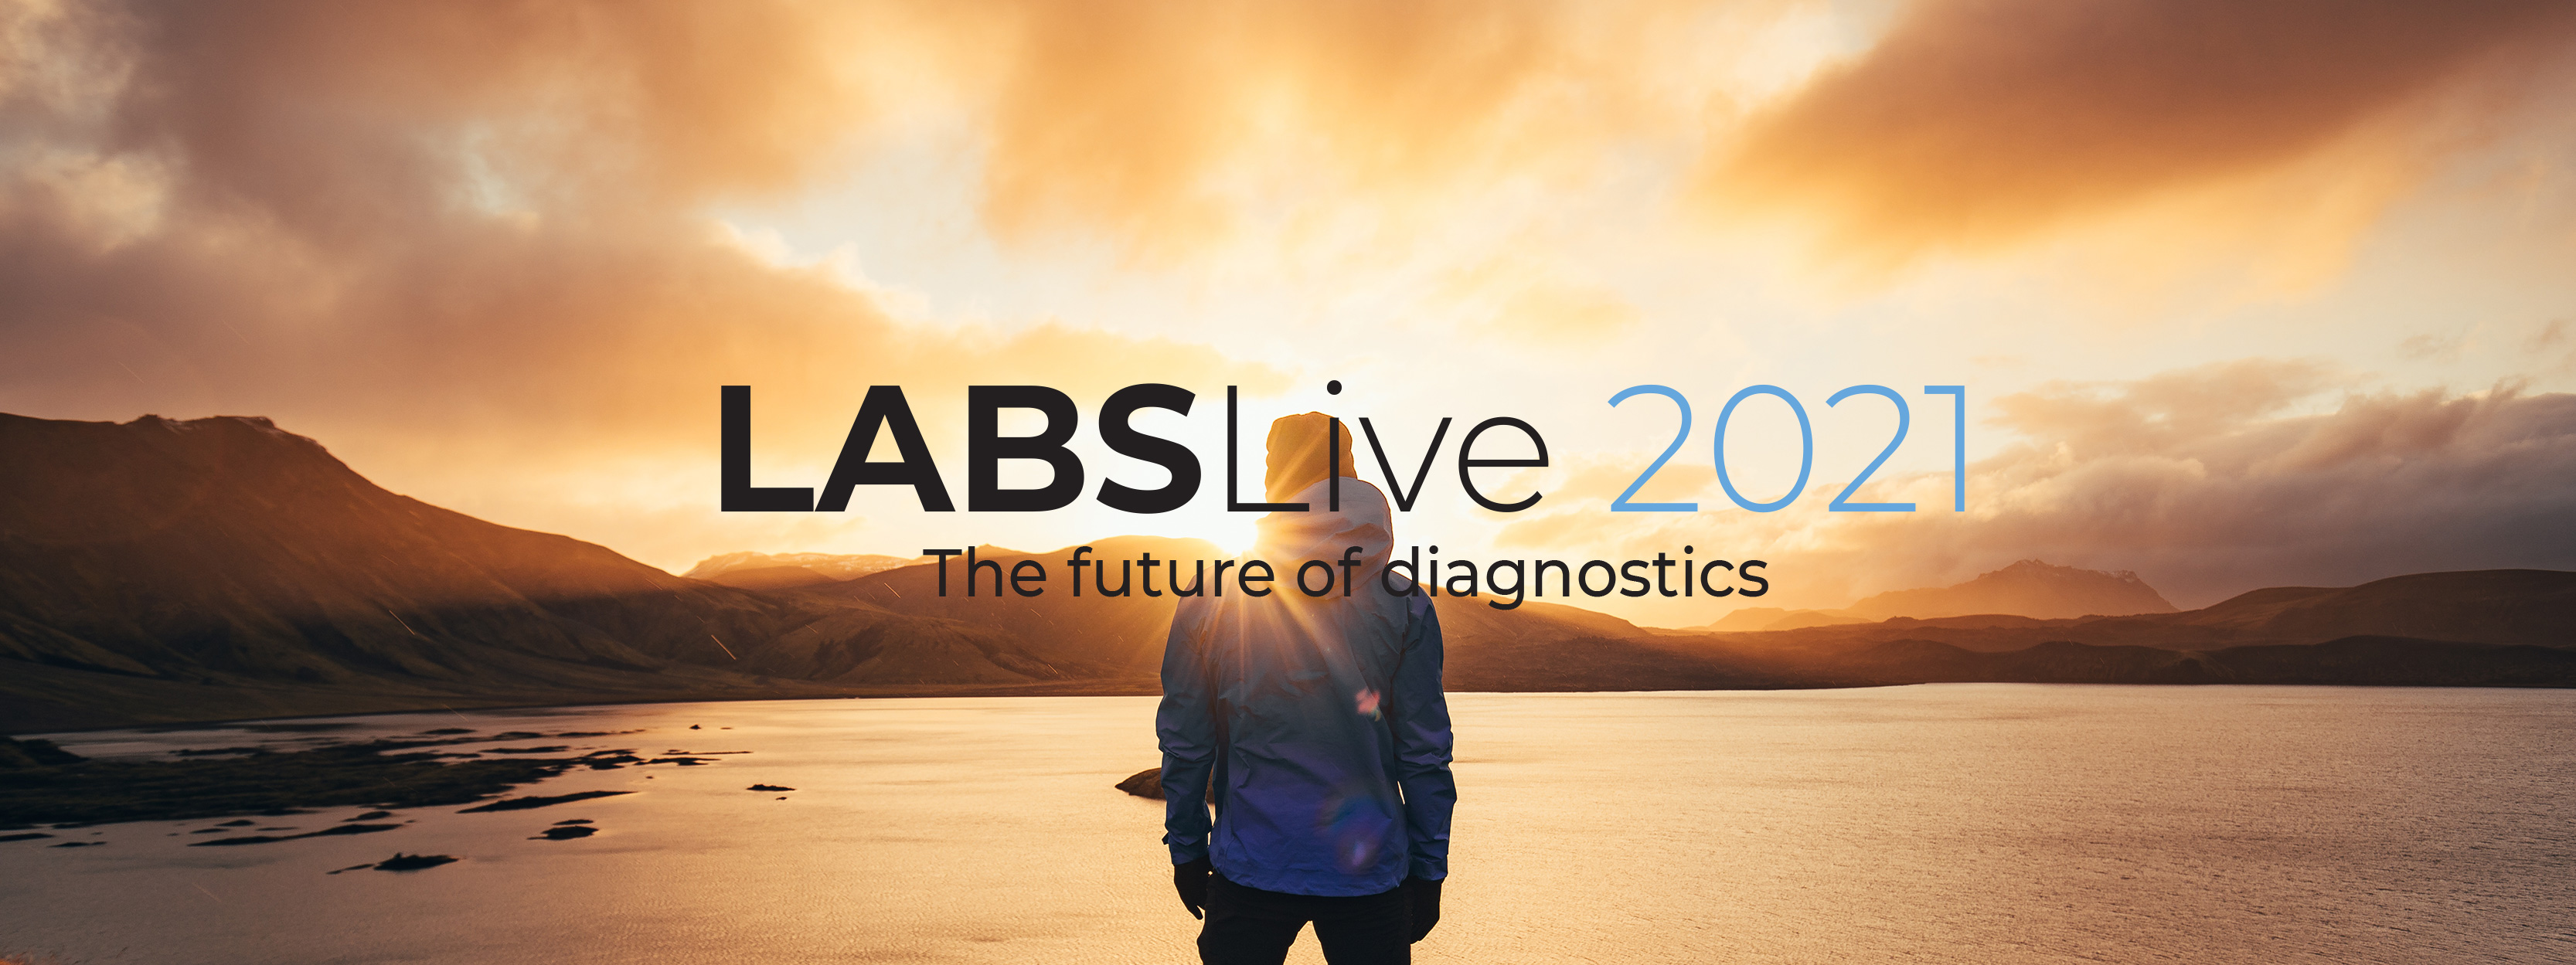 21-8-Labs_Virtual-Event_Landing2